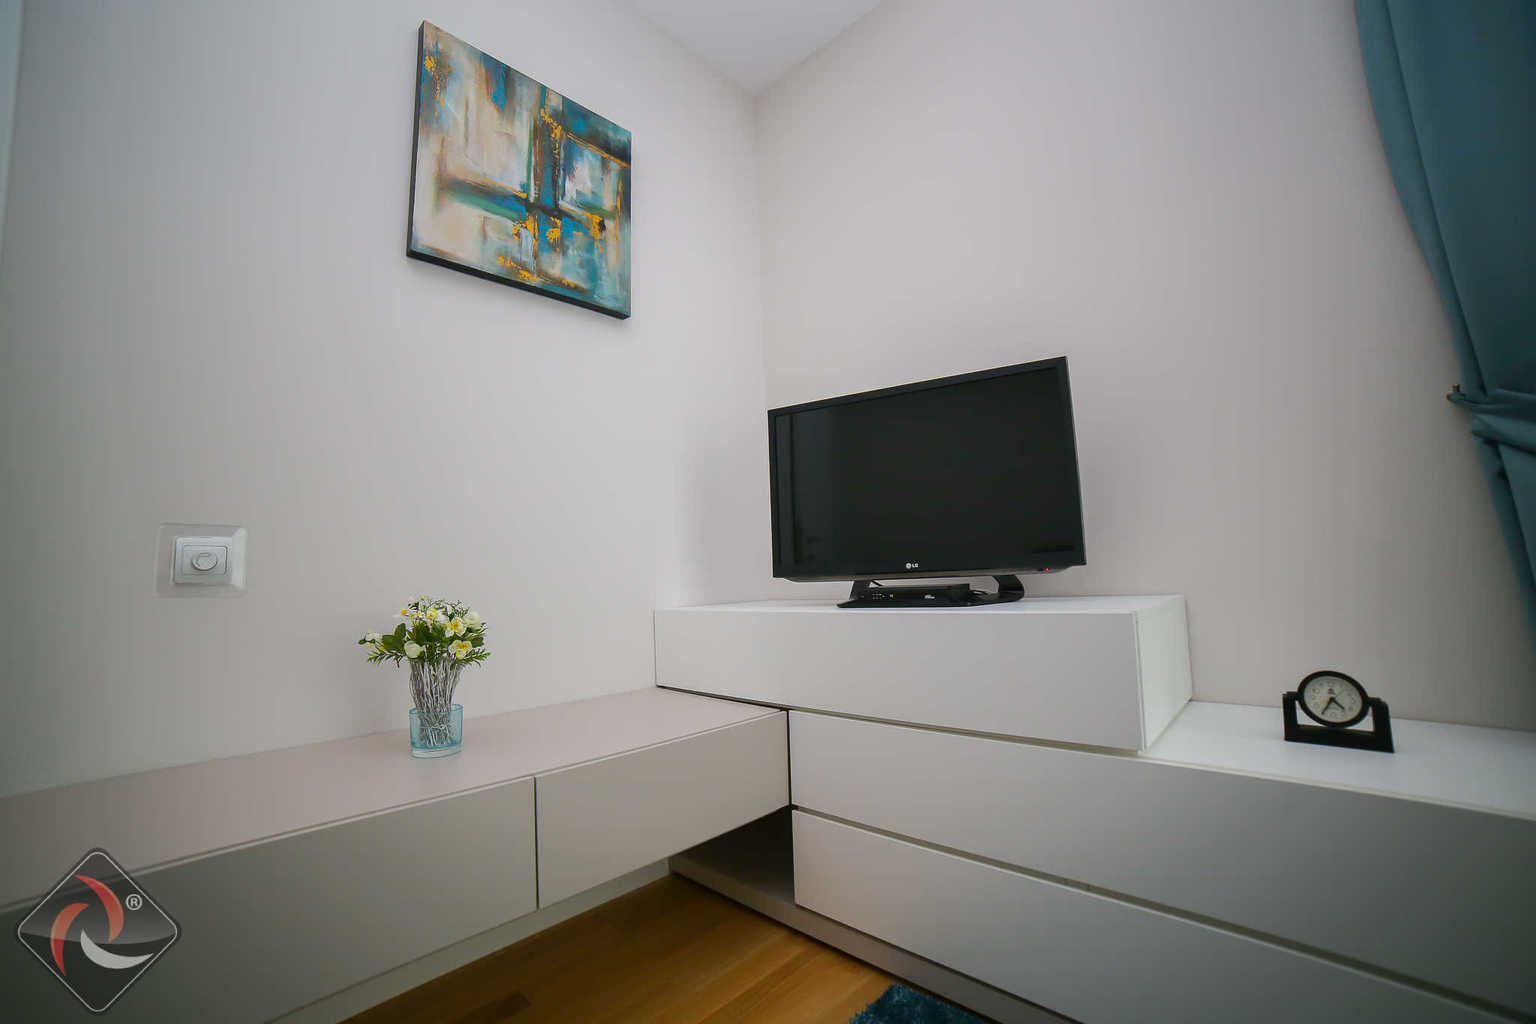 Room corner shot